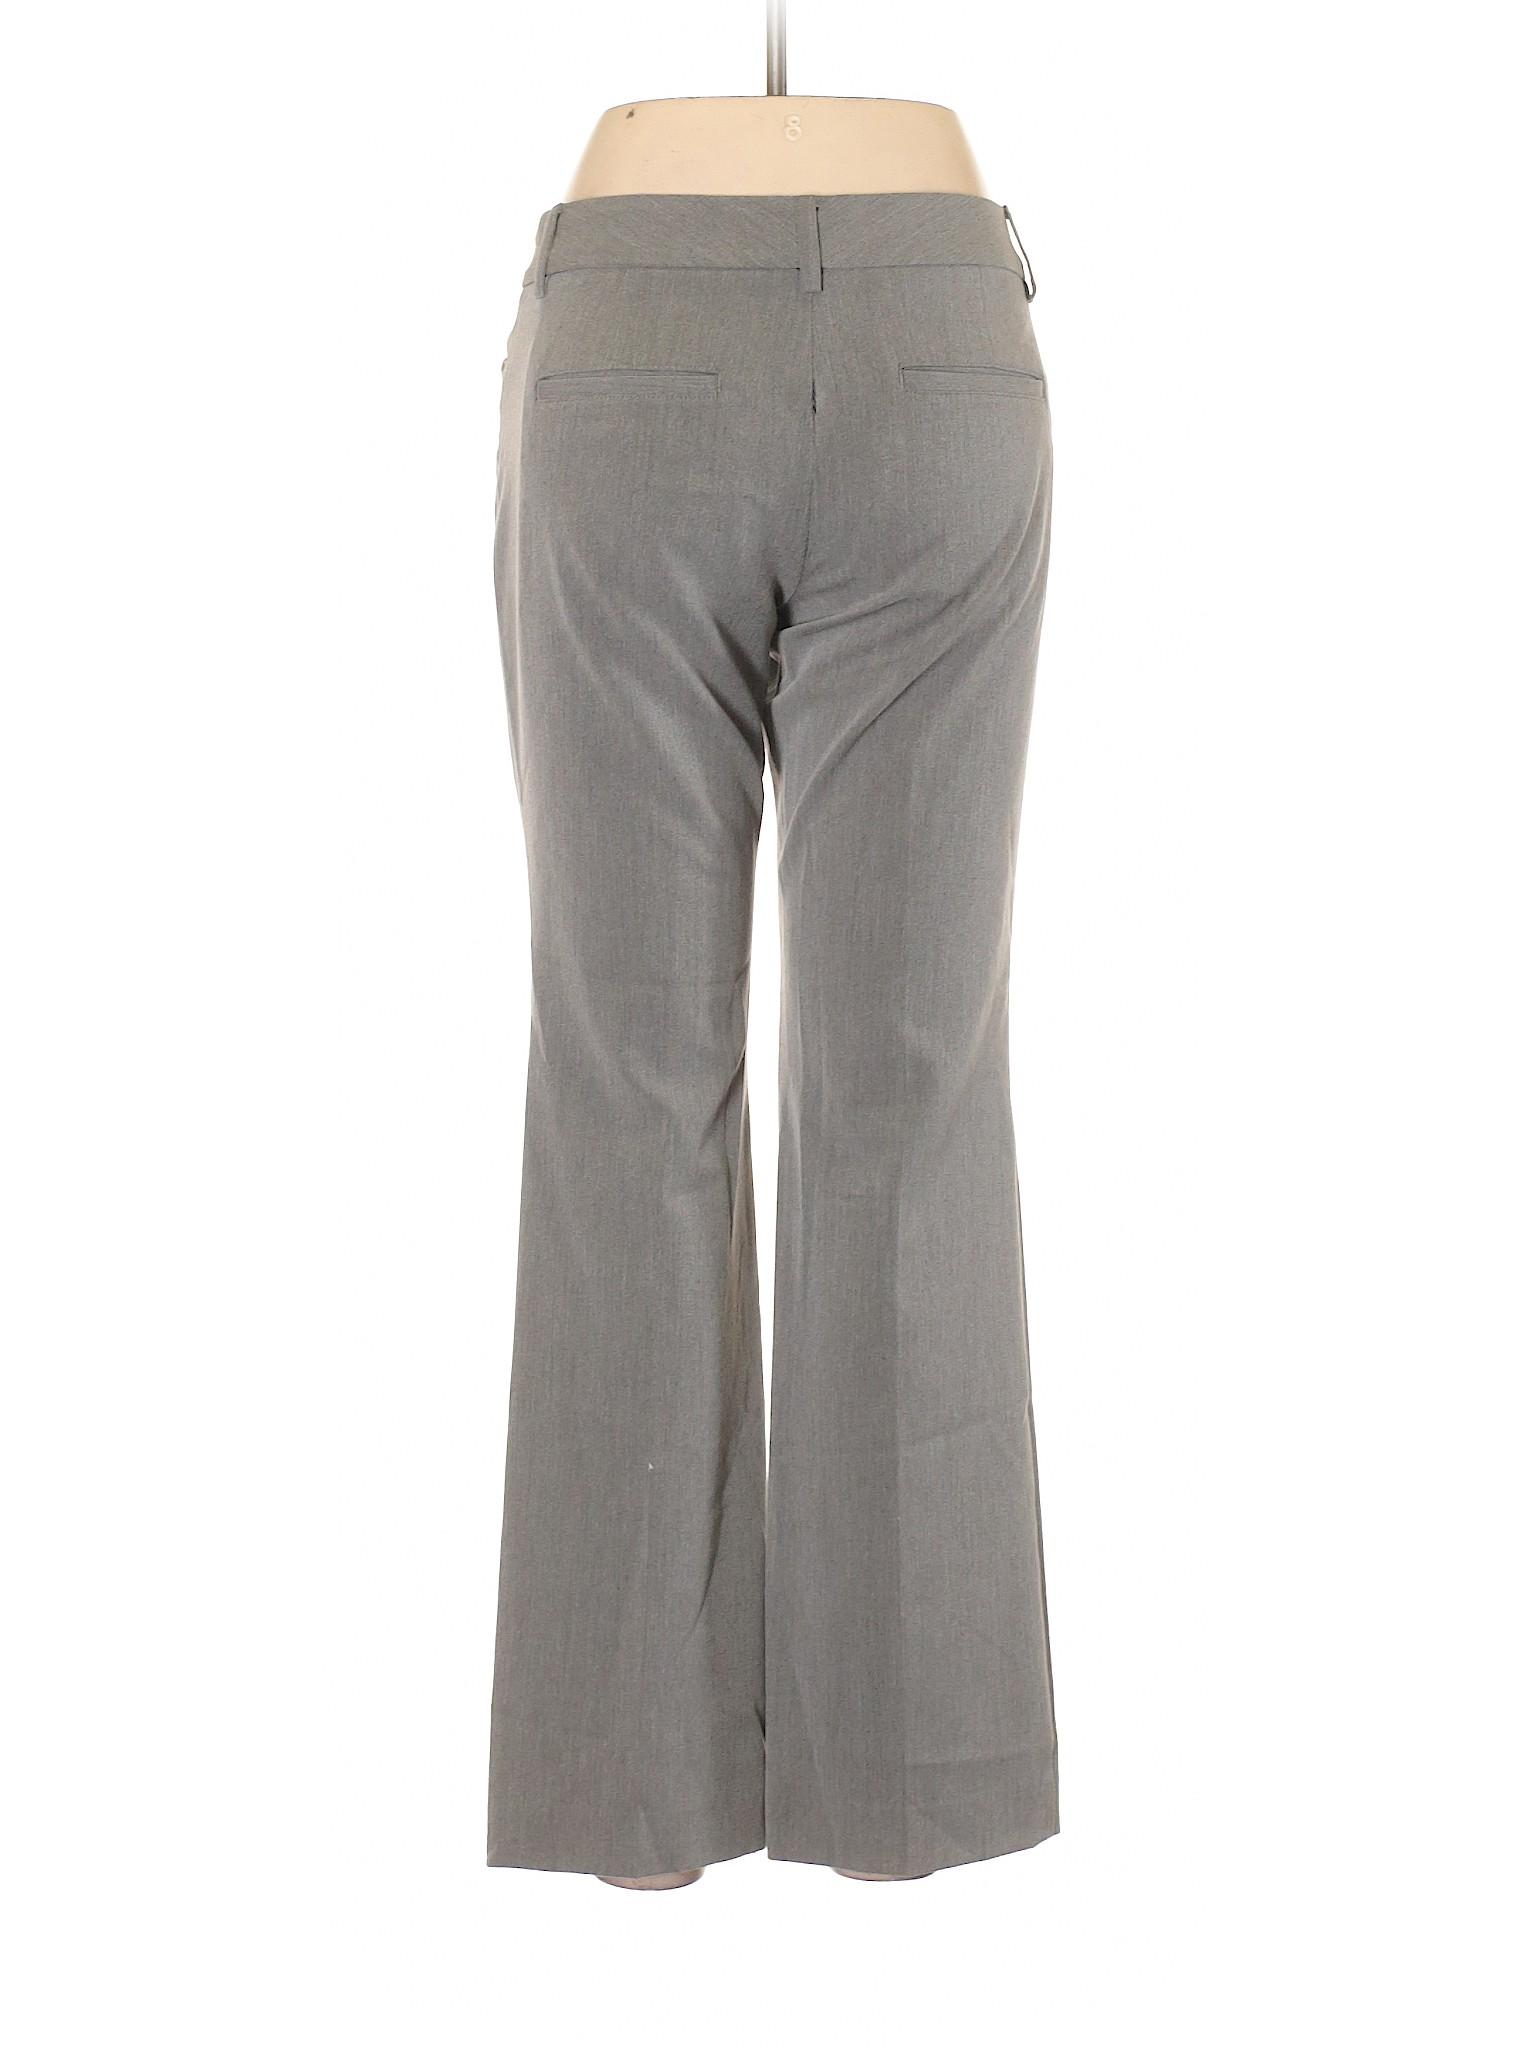 Pants Dress Dress Dress Pants Pants Boutique Dress Express Express Express Express Boutique Boutique Boutique qS6gBwdgU